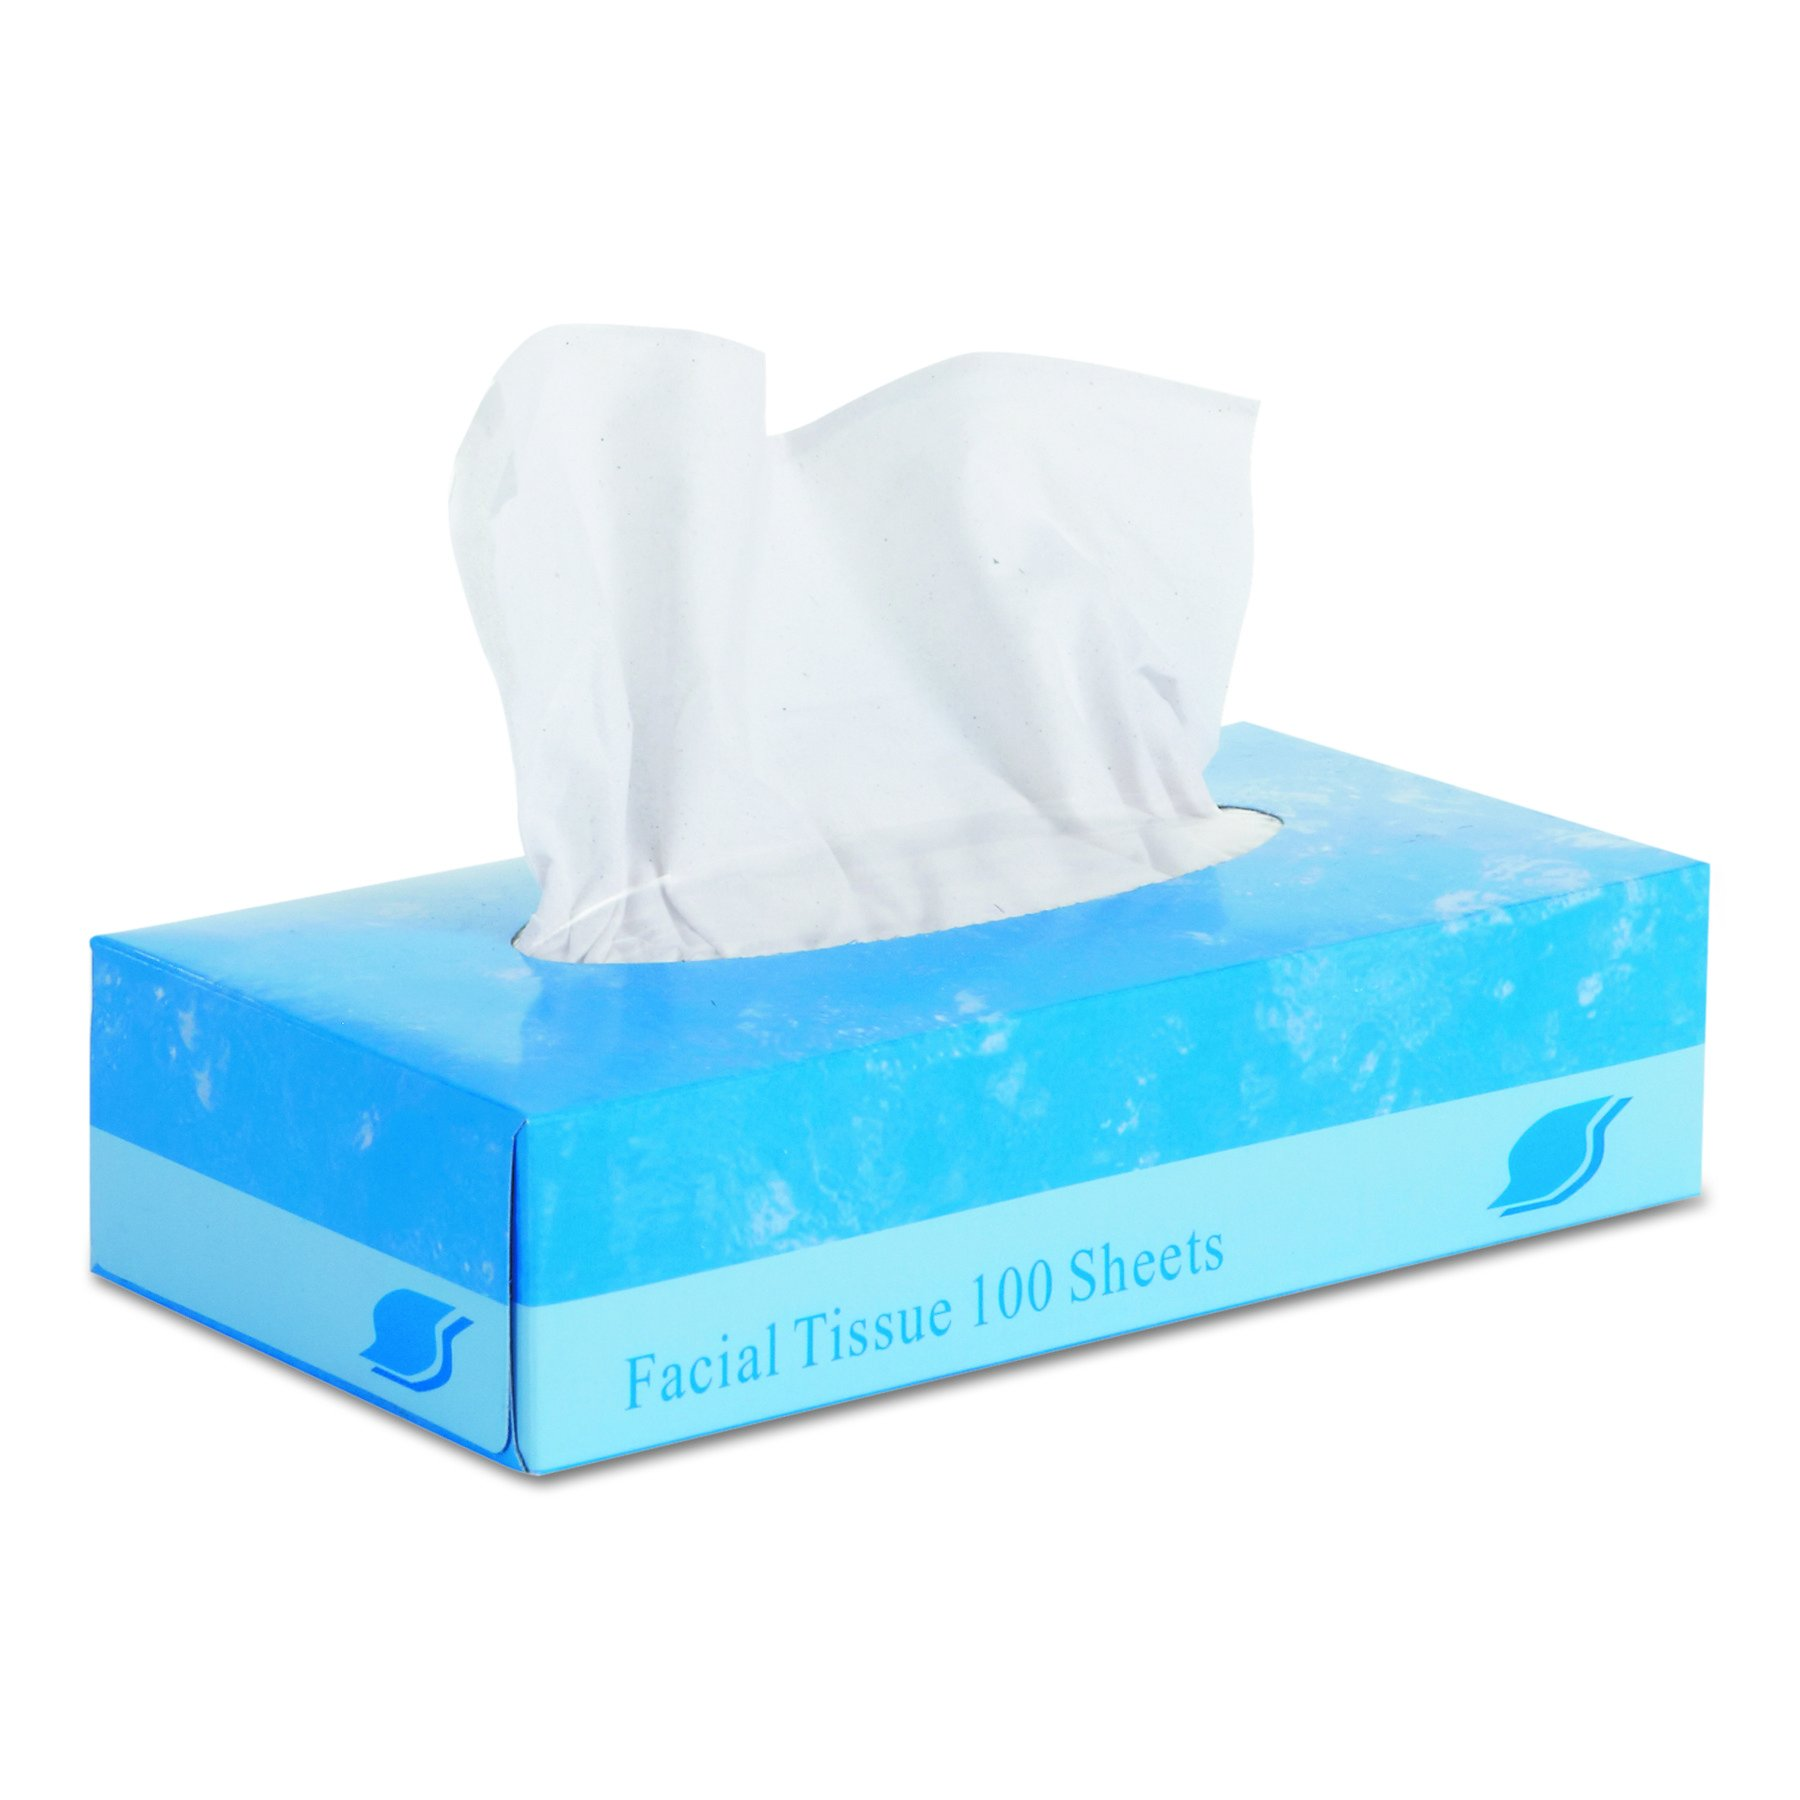 GEN 6501 Facial Tissue, Flat Box, 2-Ply, 8'' x 8.3'', 100 per Box (Case of 30 Boxes)